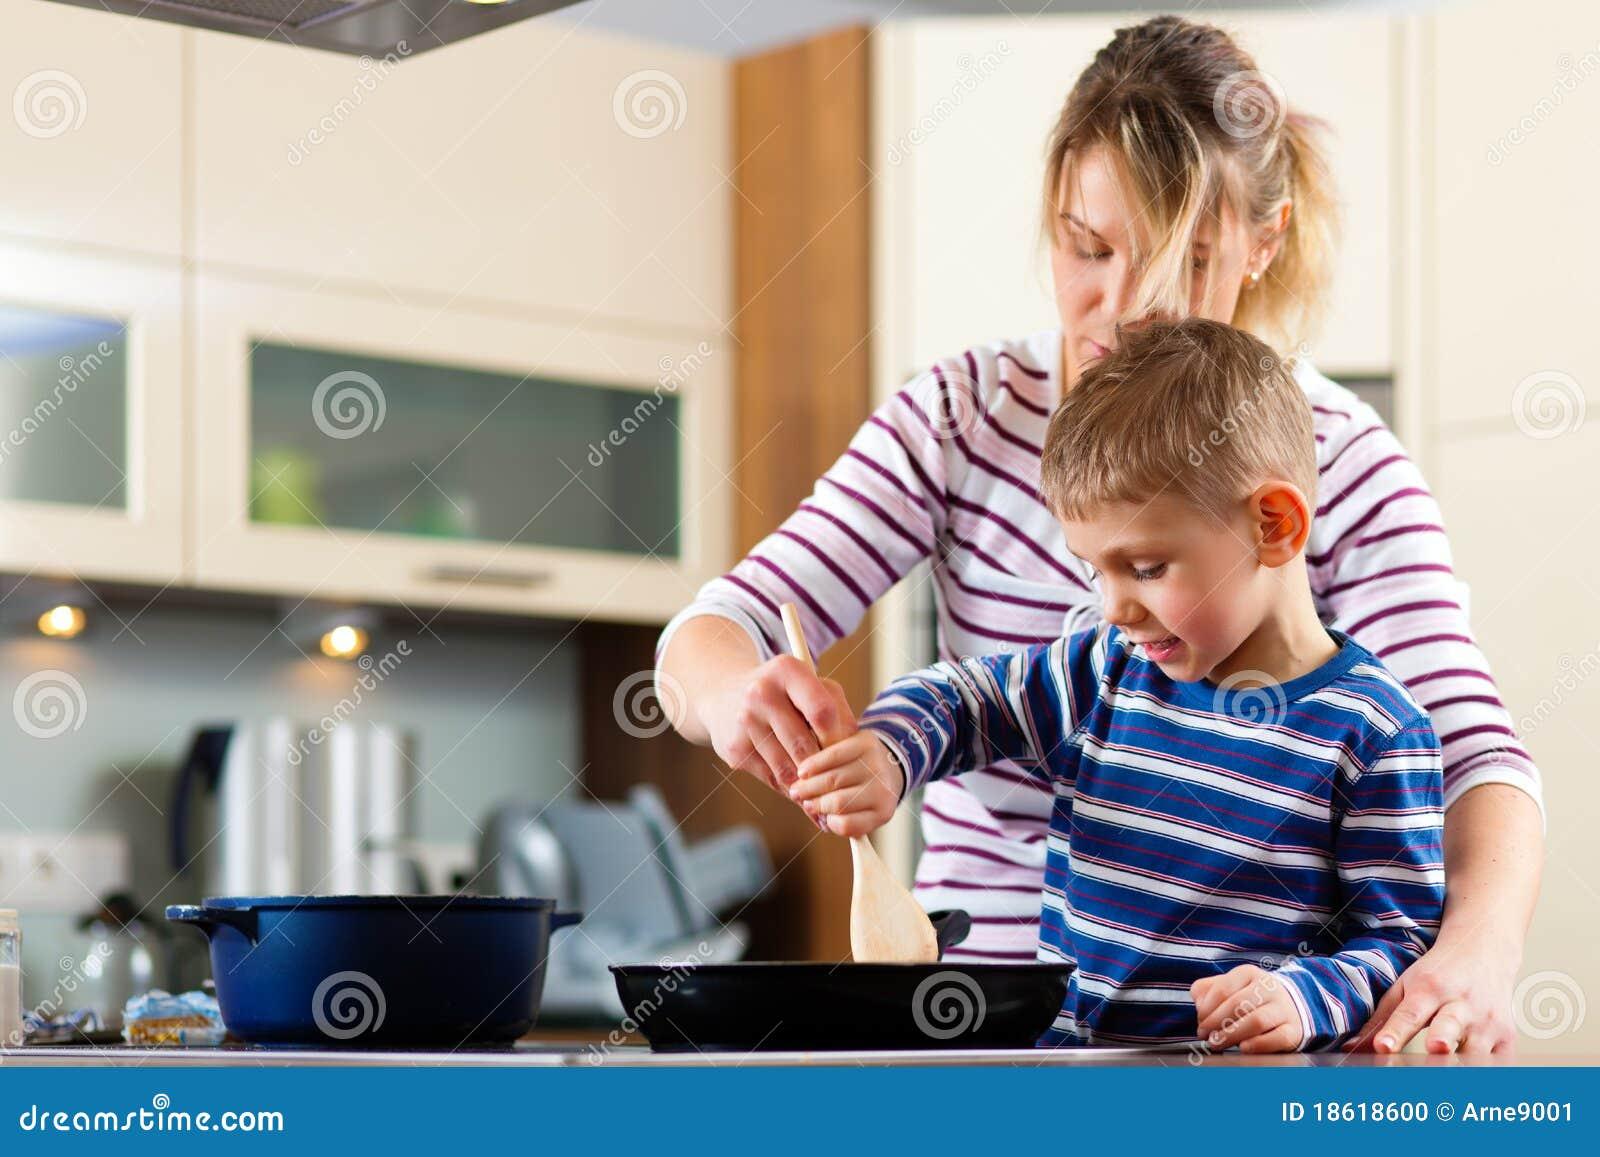 Familia que cocina en cocina foto de archivo imagen for Canal cocina cocina de familia